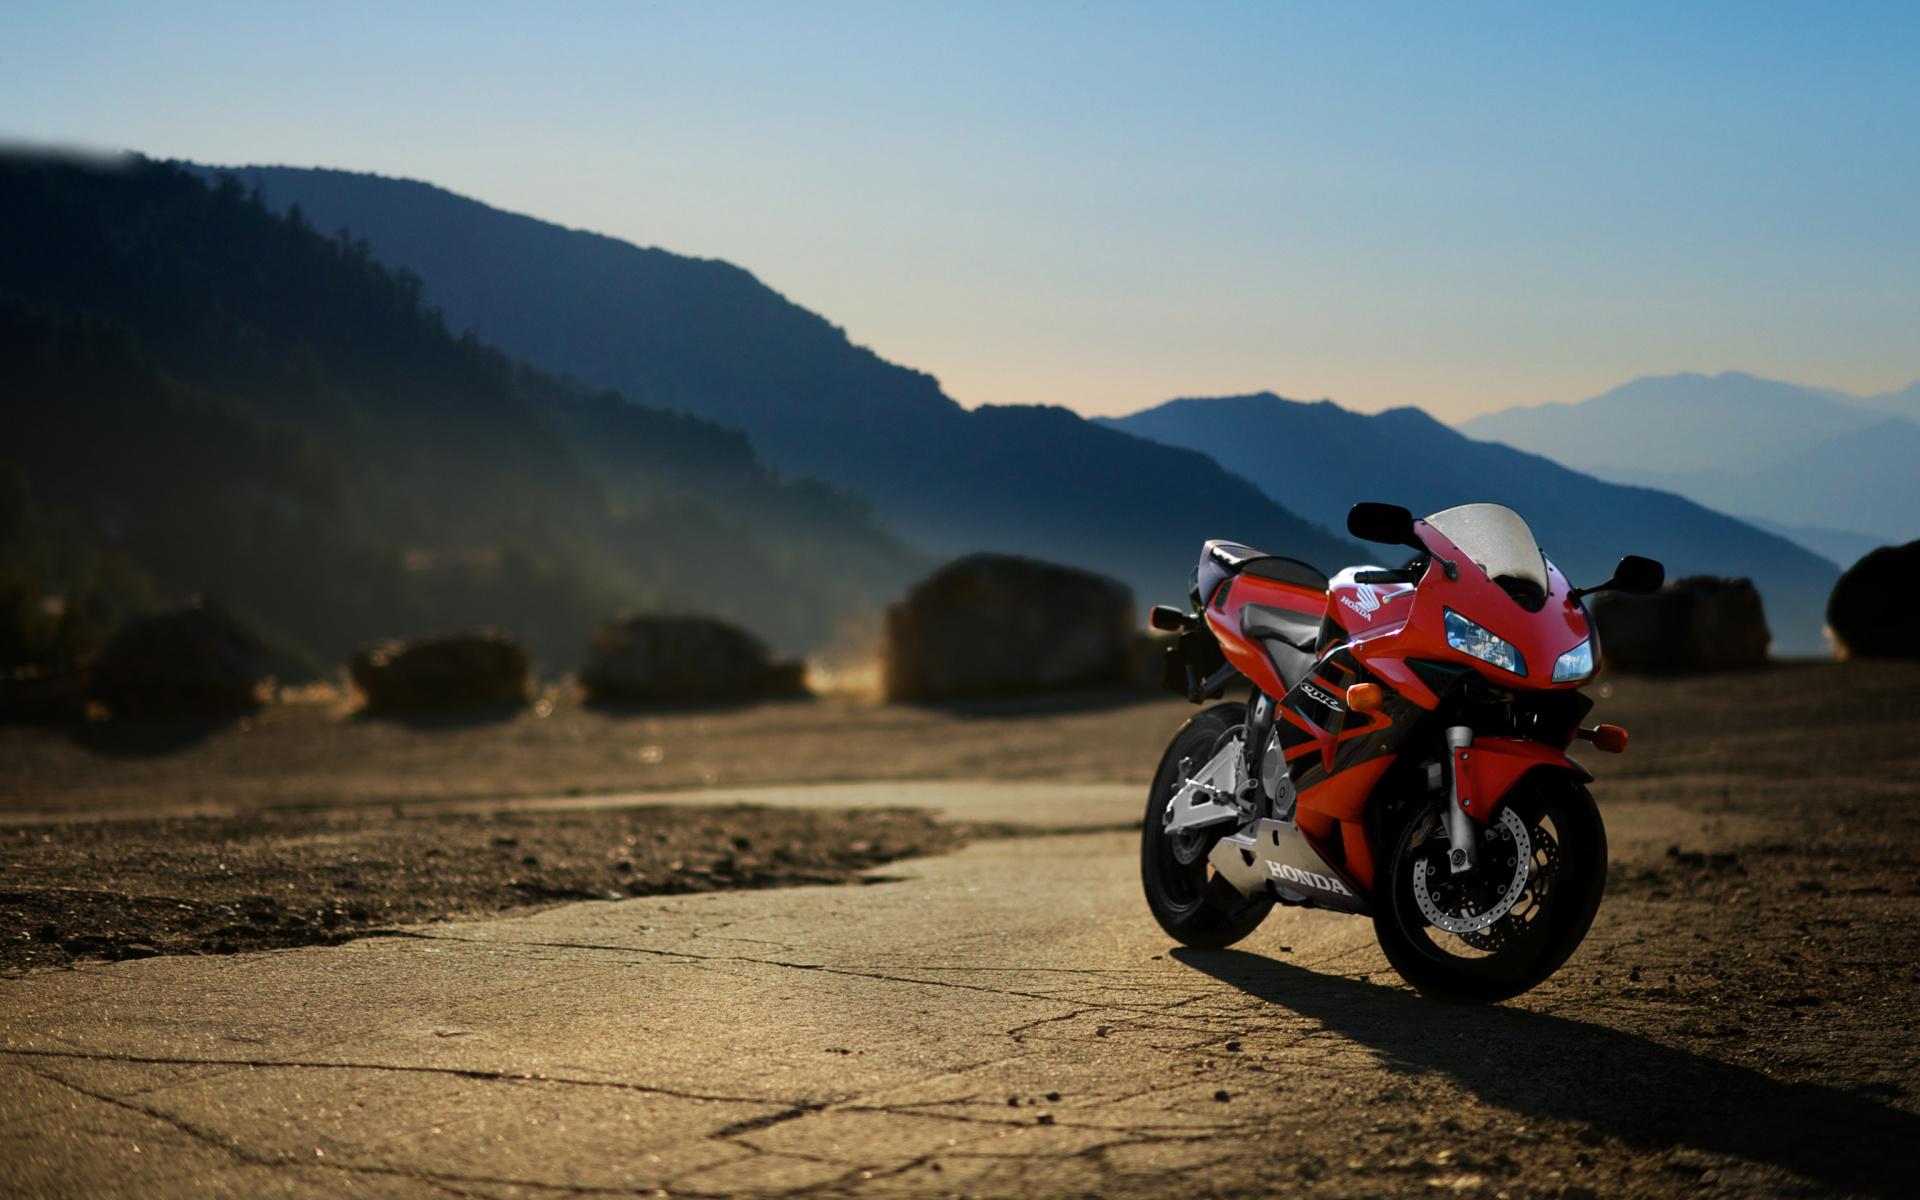 3840x2160 Honda CBR 600RR 4k HD 4k Wallpapers, Images